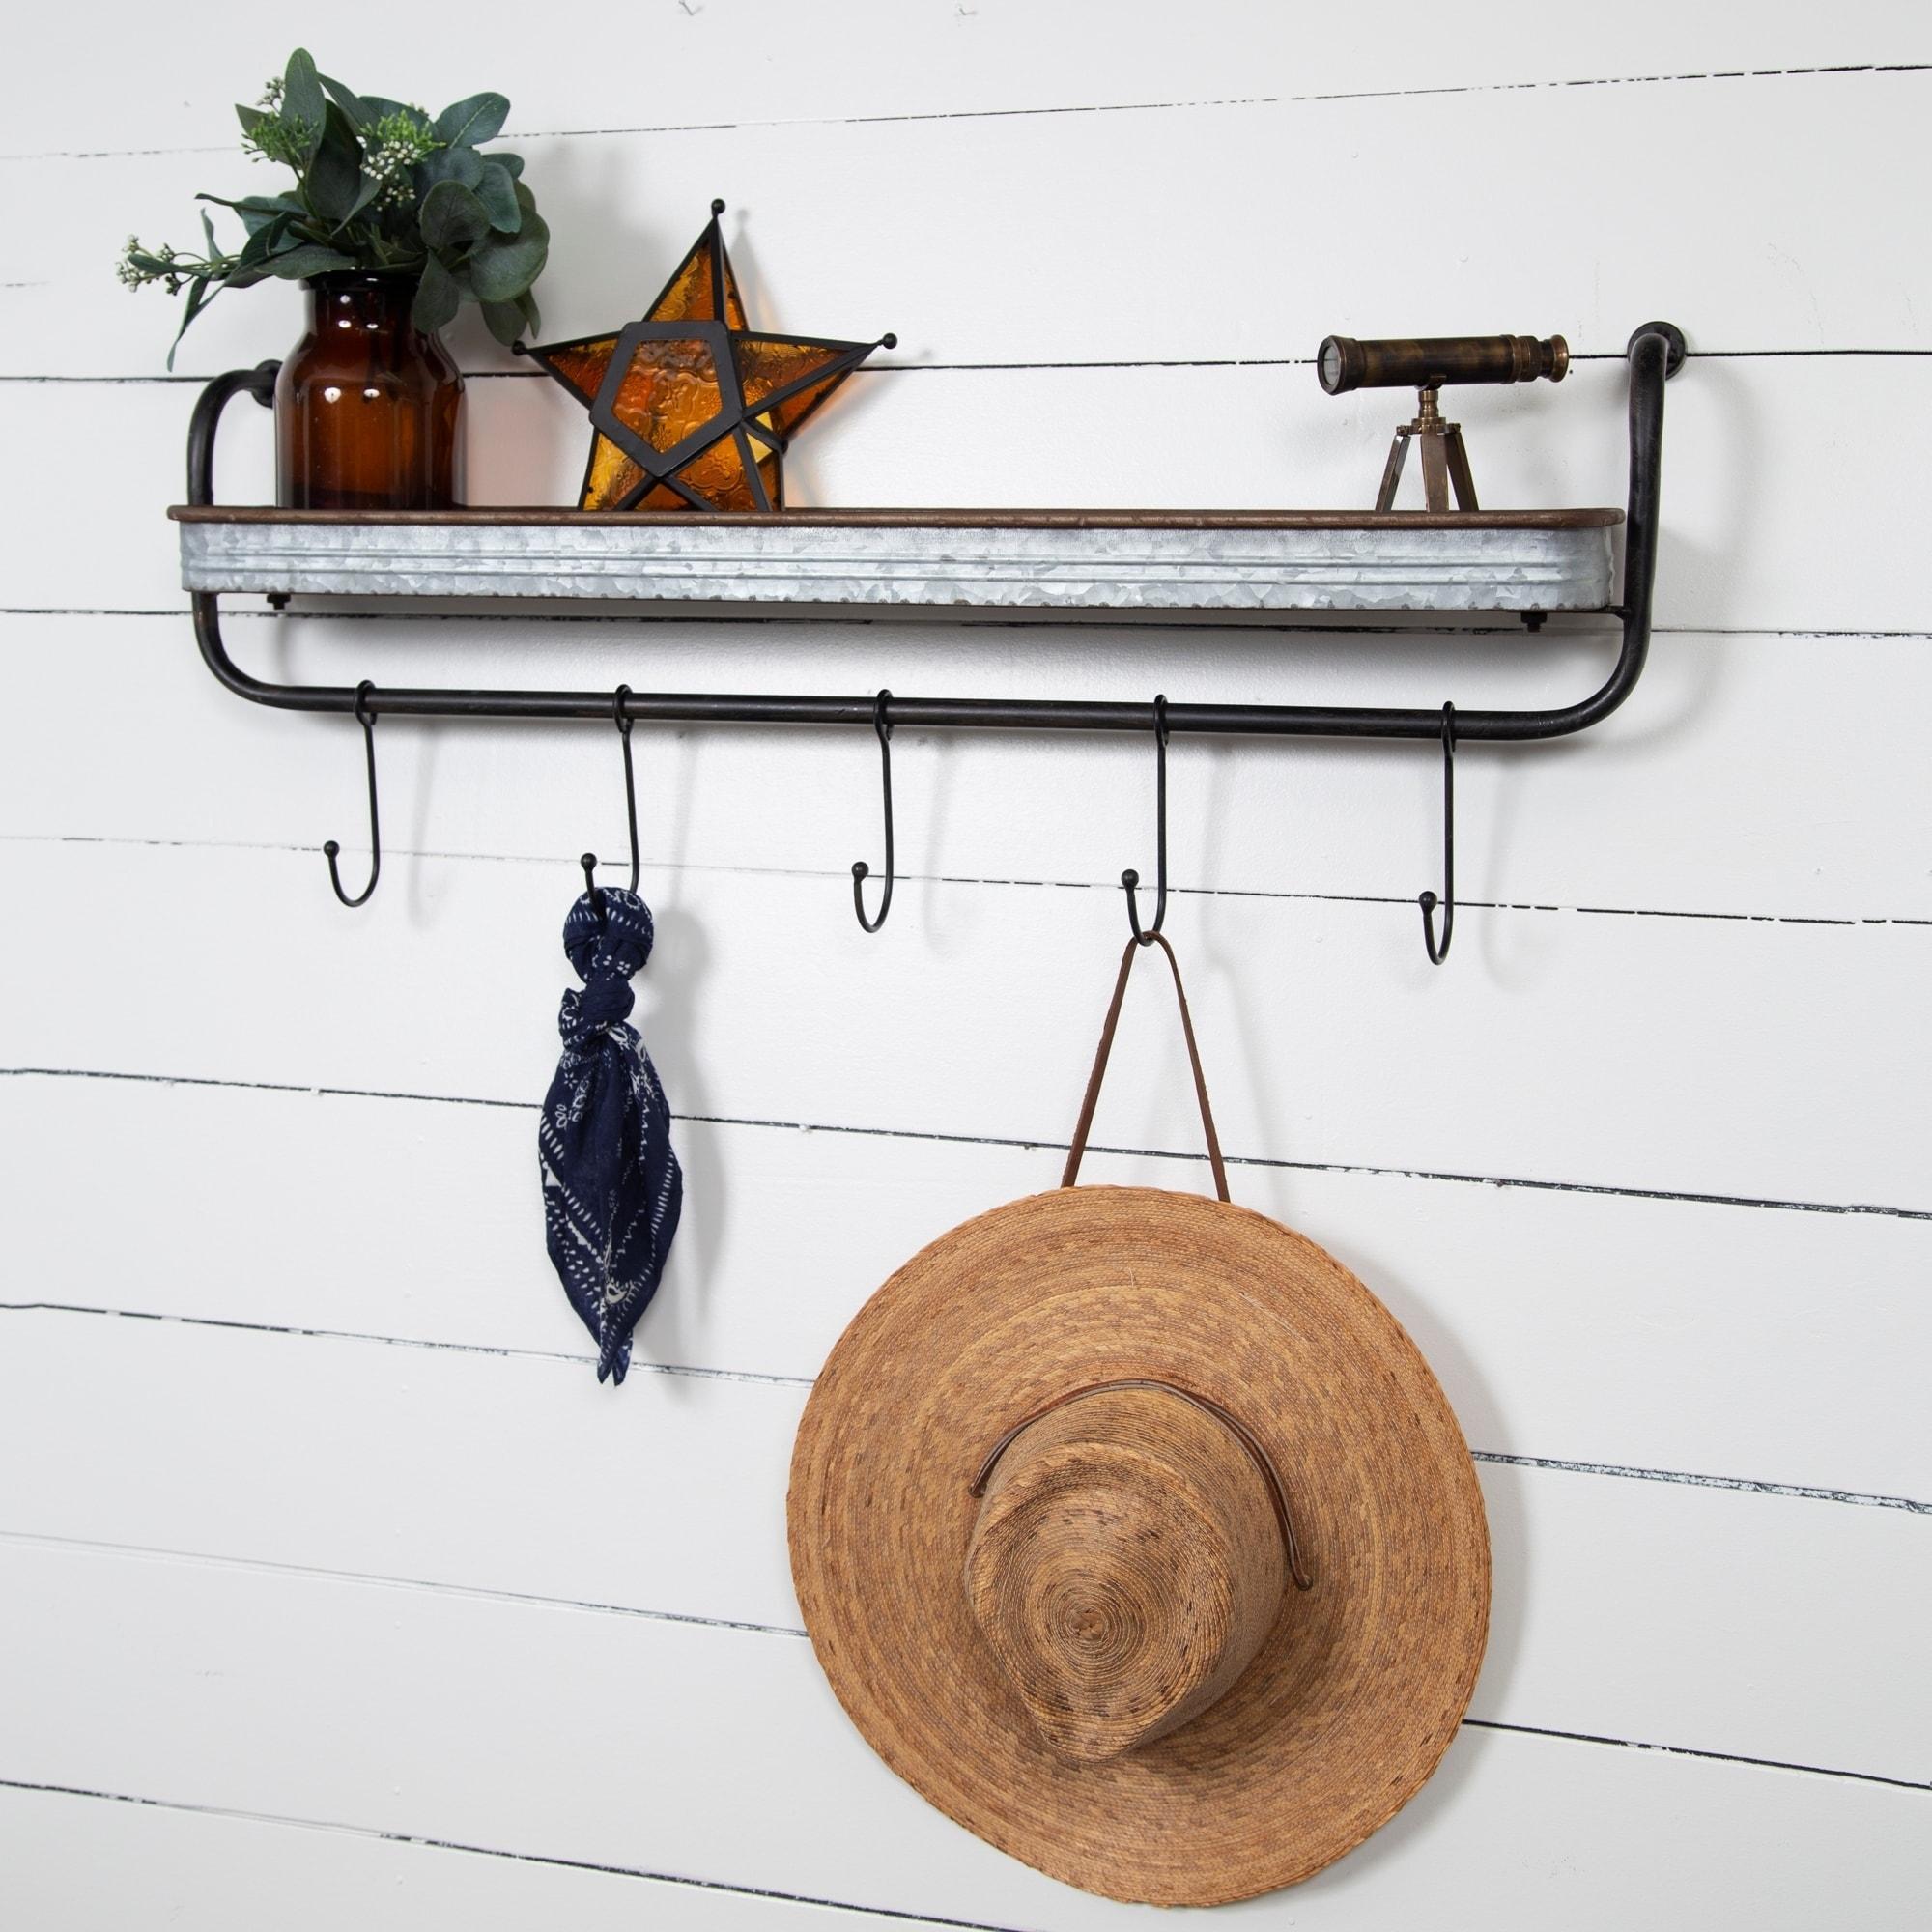 Rustic Galvanized Metal Wall Shelf Storage With Hooks